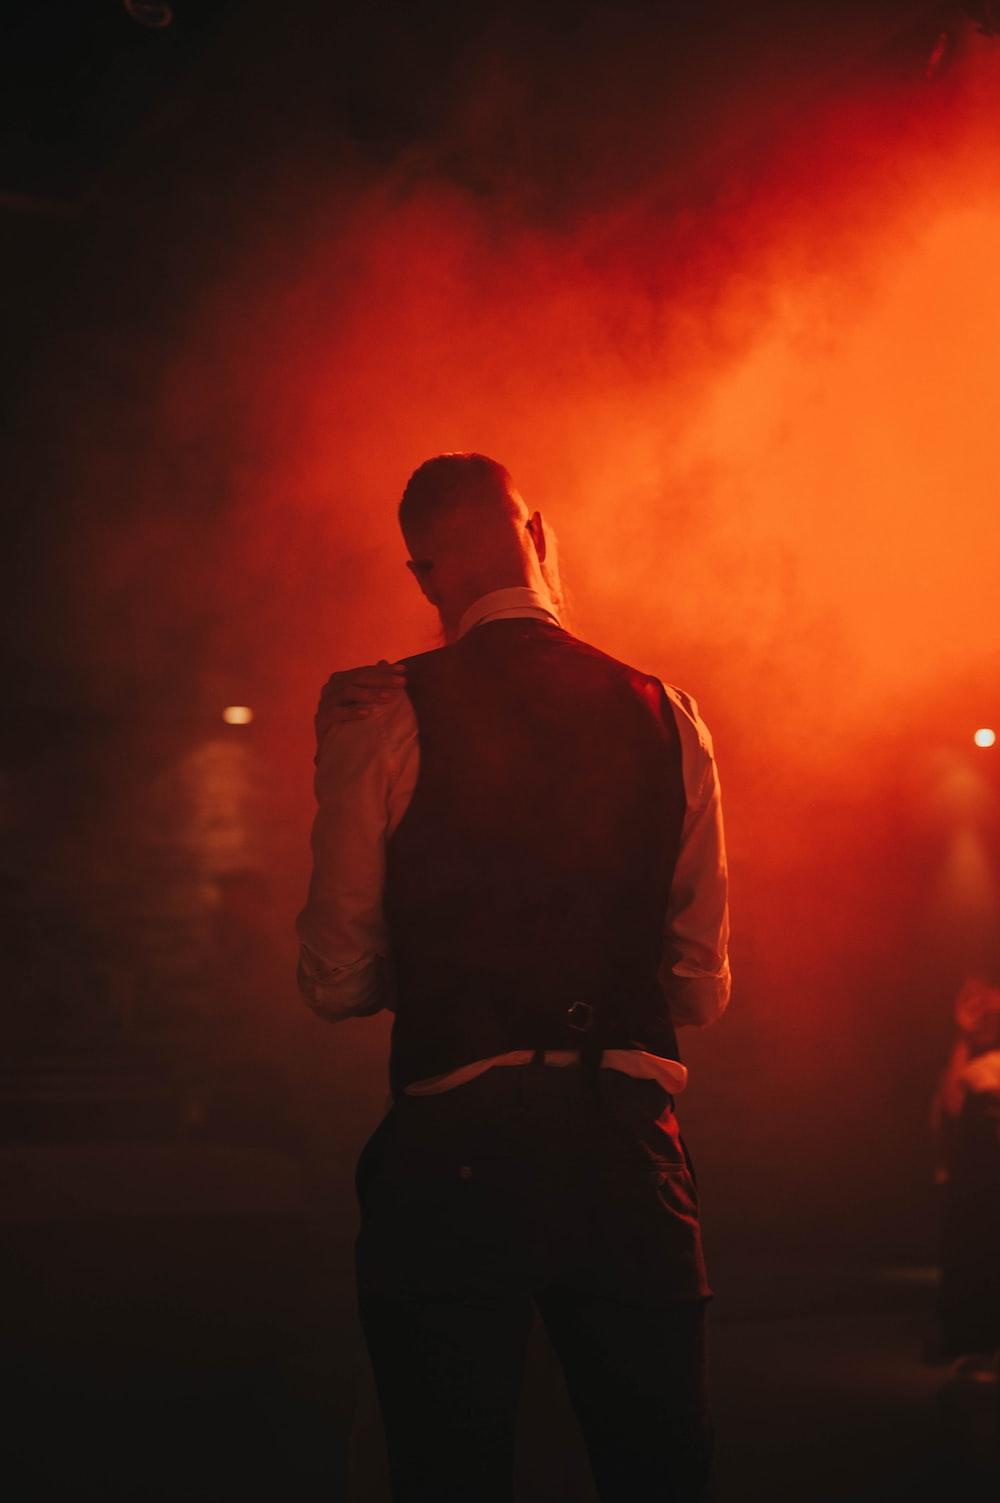 man in black vest standing on stage